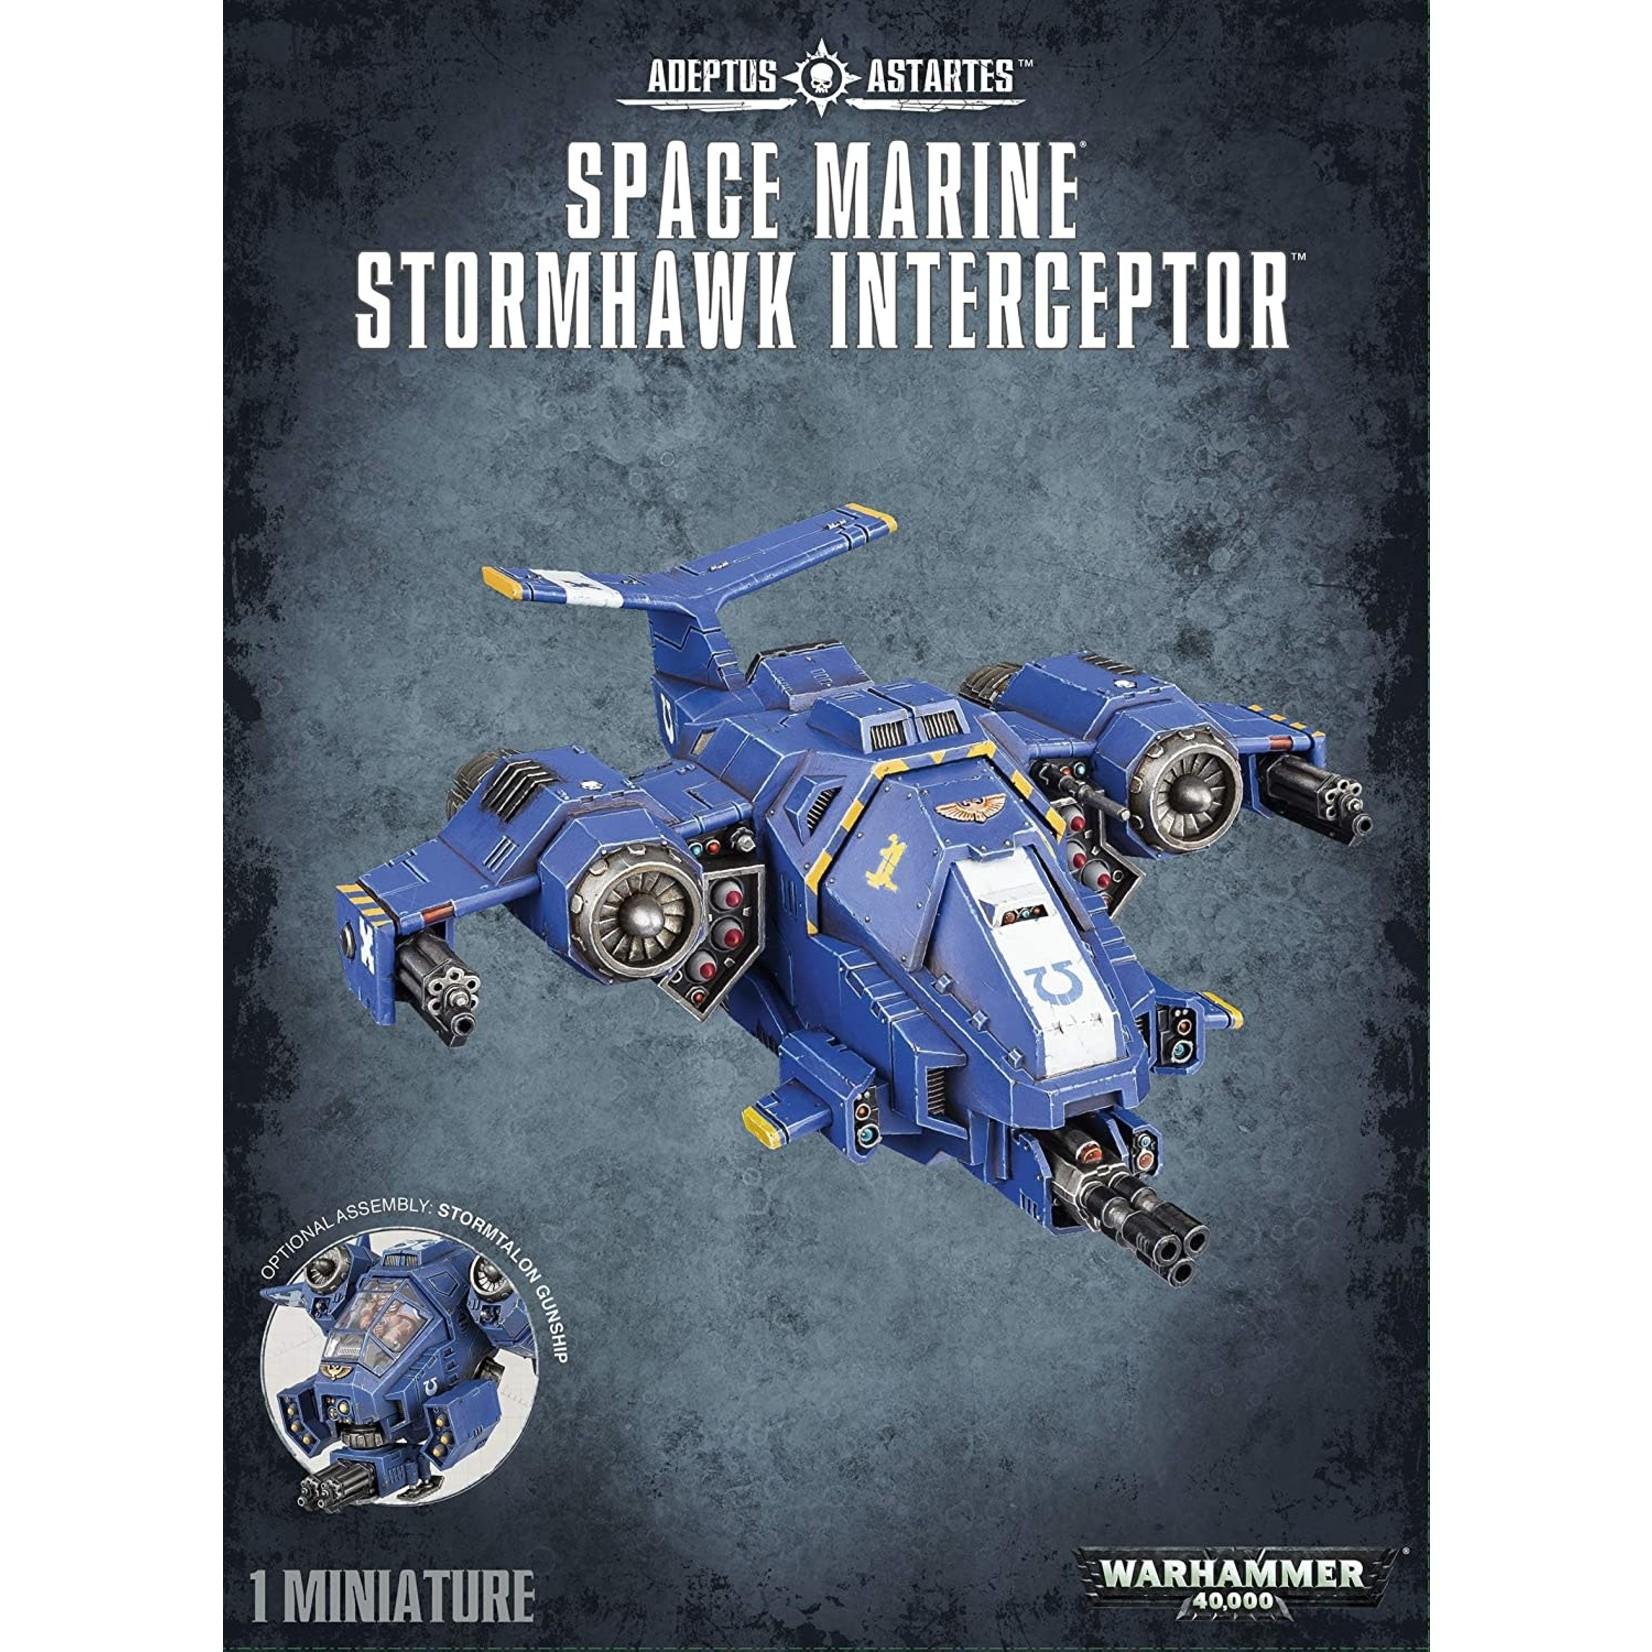 Space Marine Stormhawk Interceptor (40K)